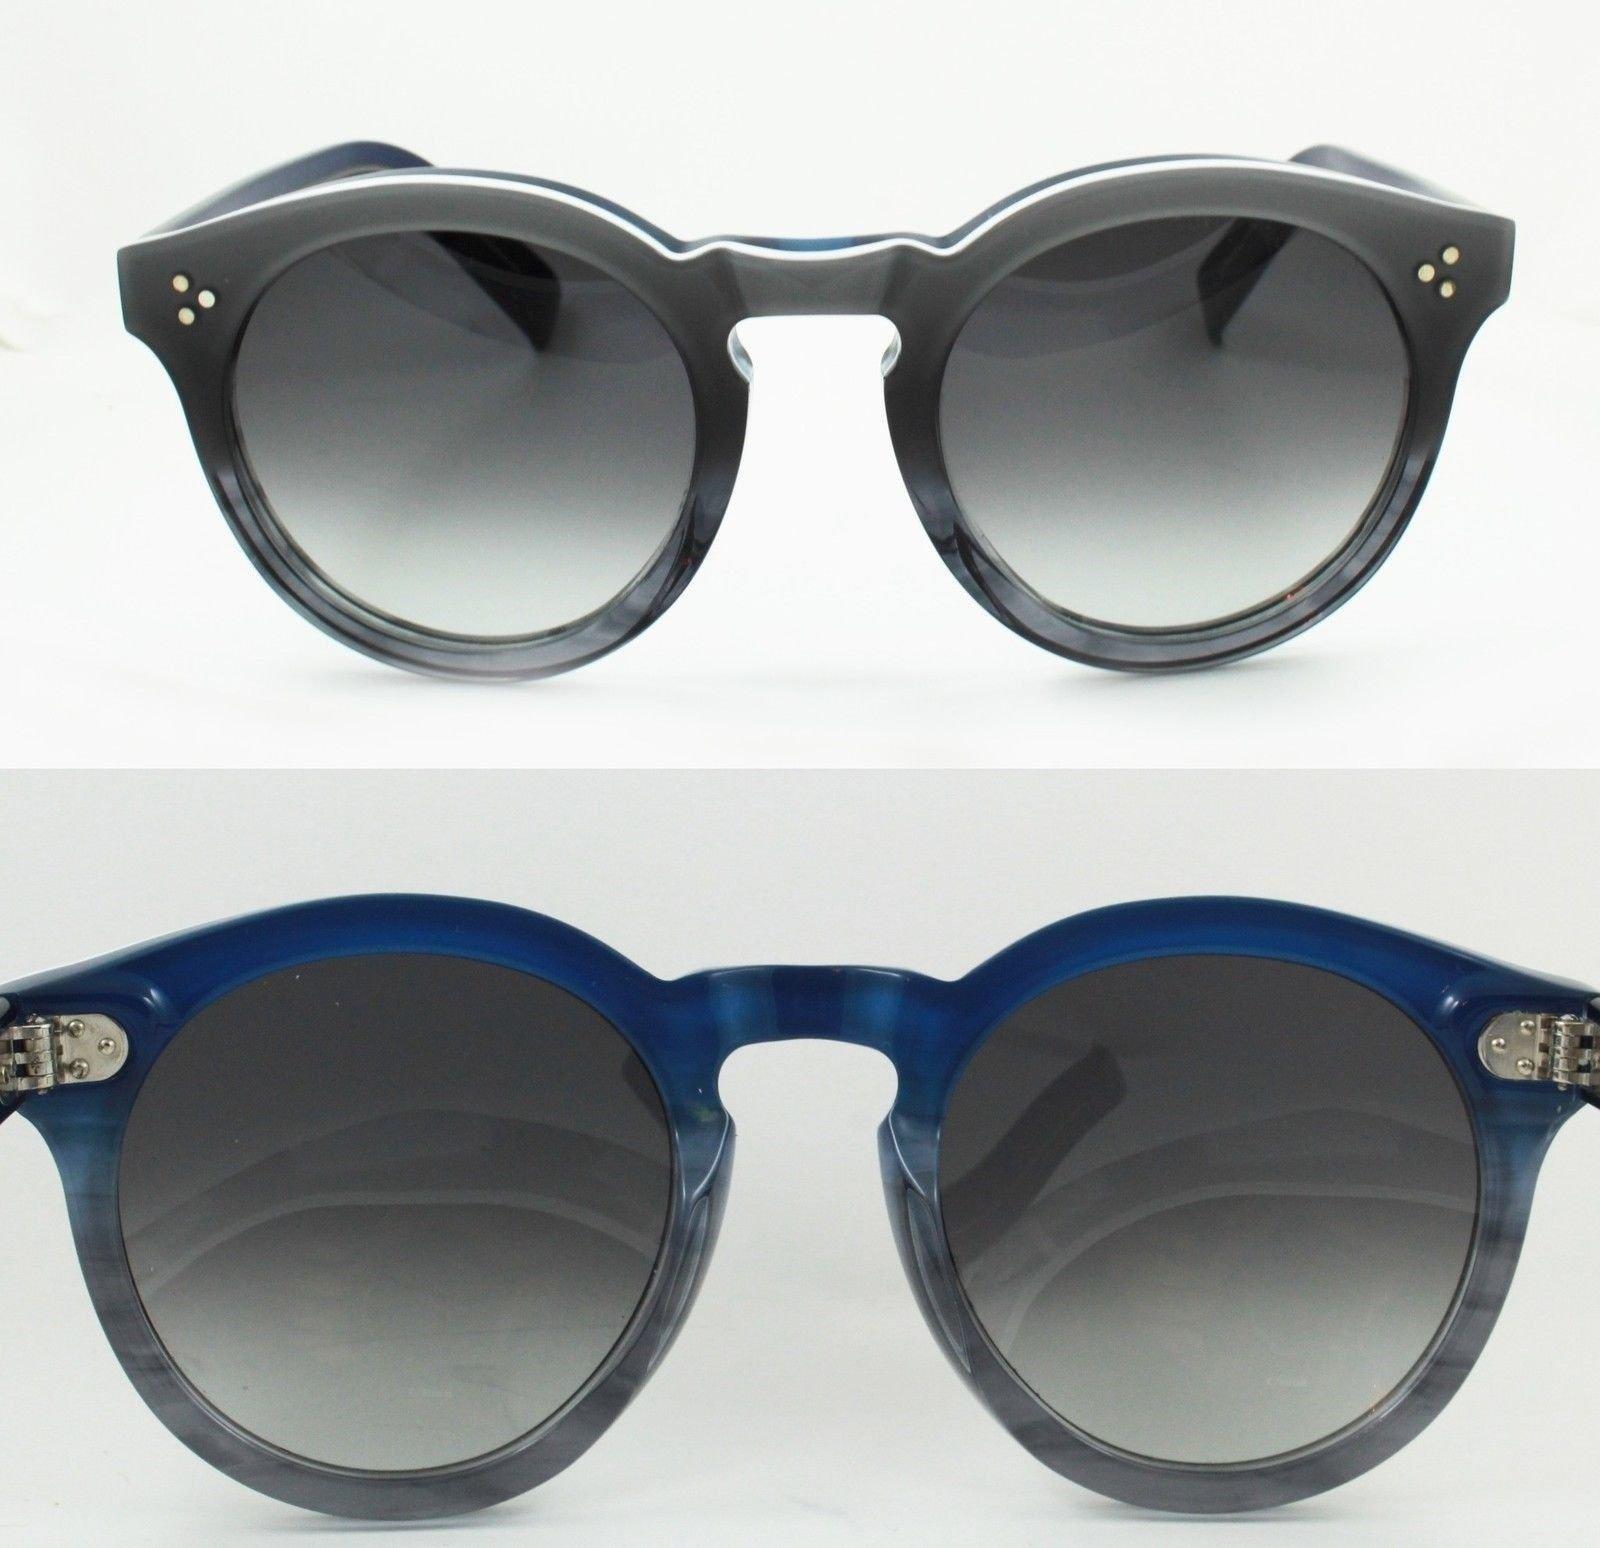 Illesteva Leonard Ii Sunglasses Gray Ombre And Blue Frame